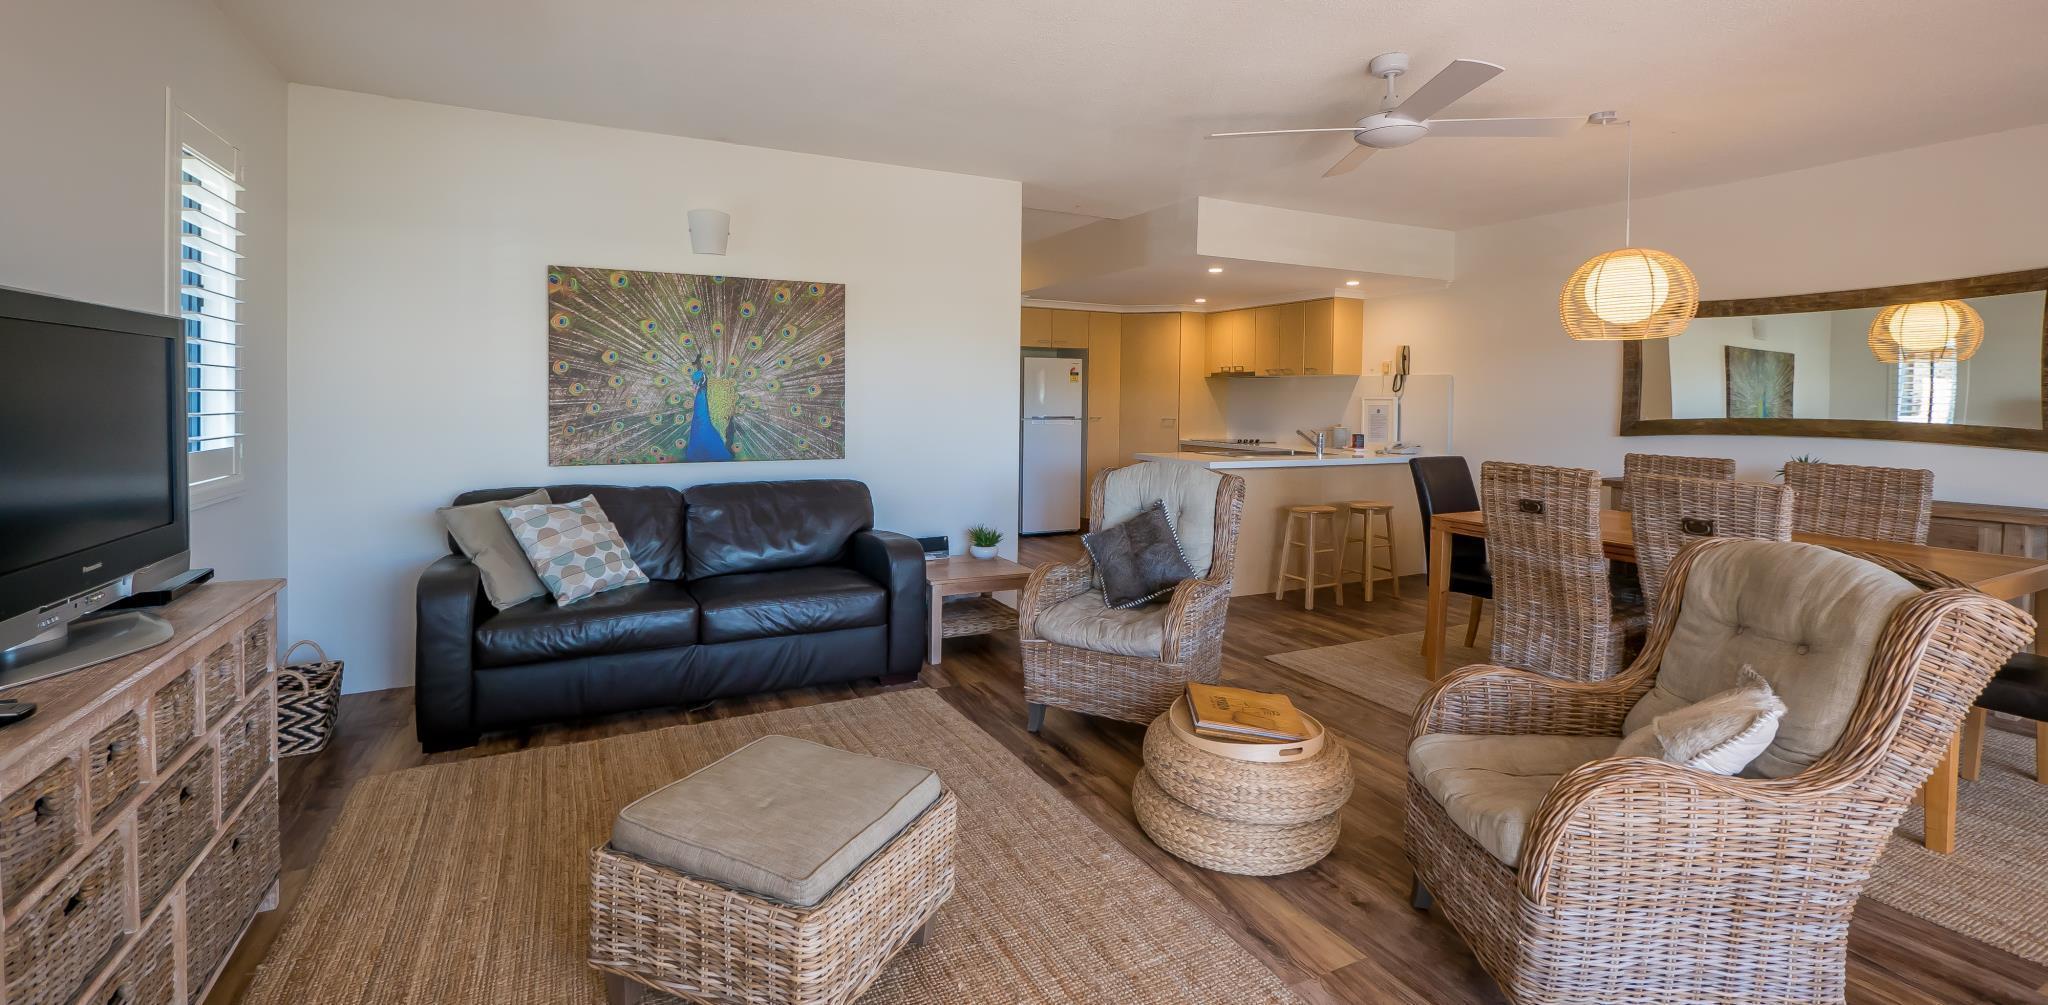 Byron Quarter Holiday Apartments, Byron